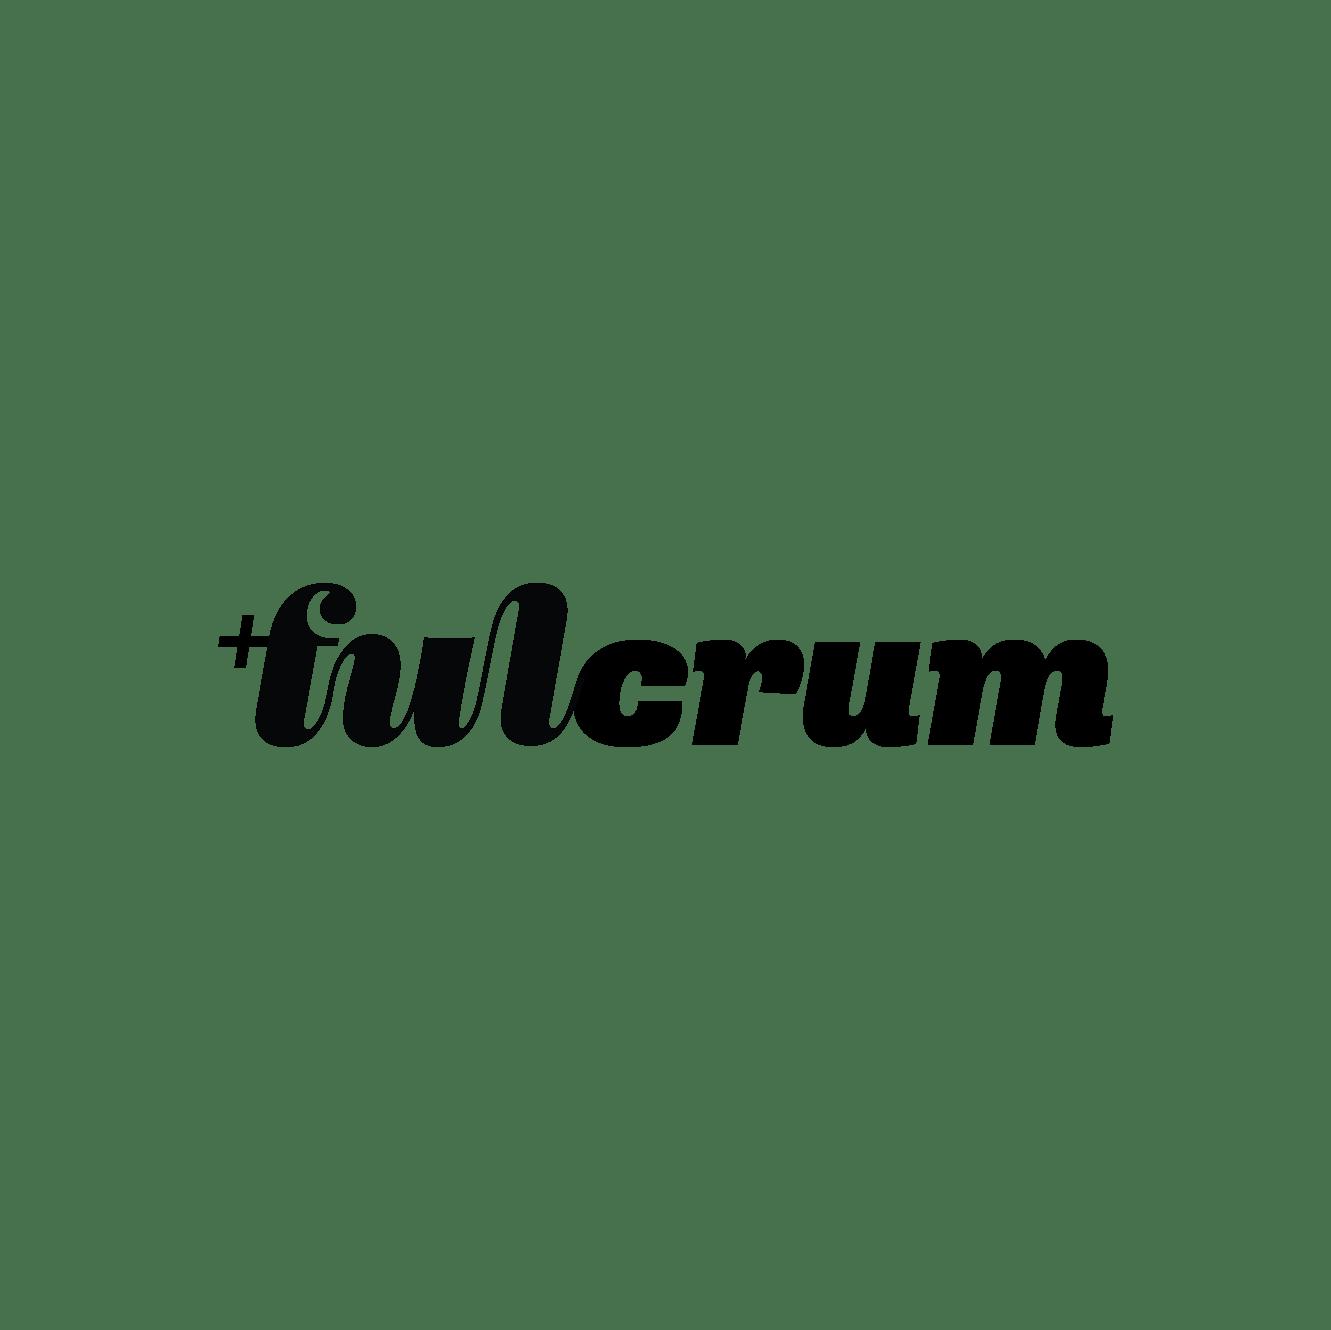 fulcrum_logosinitialselects_020419-41